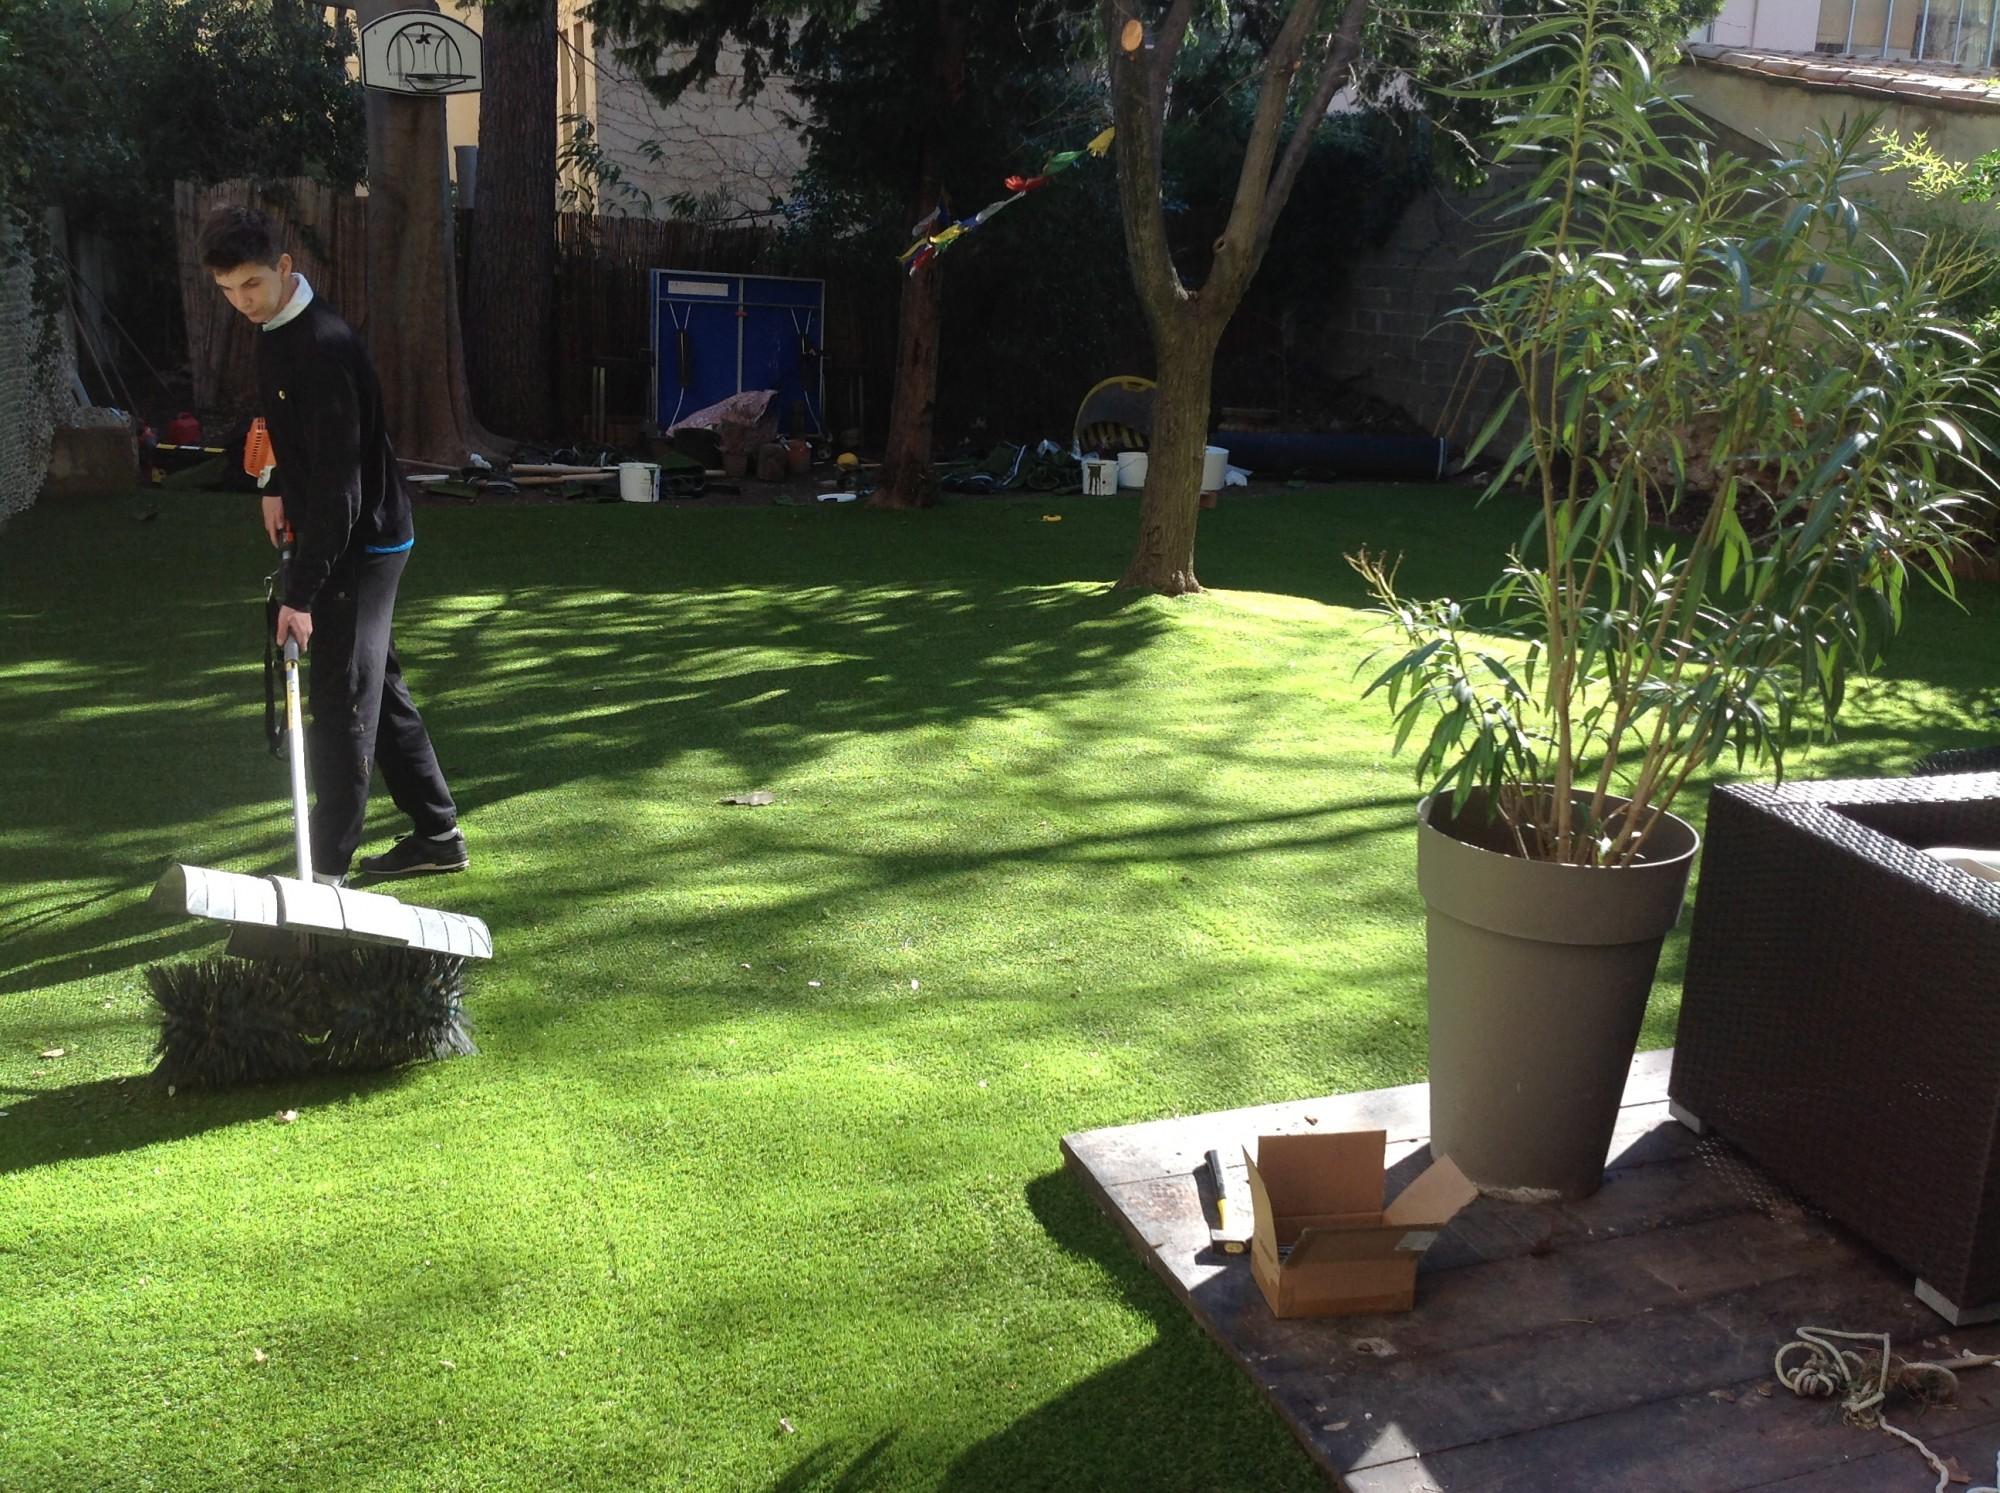 pose de gazon synth tique aix en provence la pose gazon synth tique gazon et pelouse. Black Bedroom Furniture Sets. Home Design Ideas